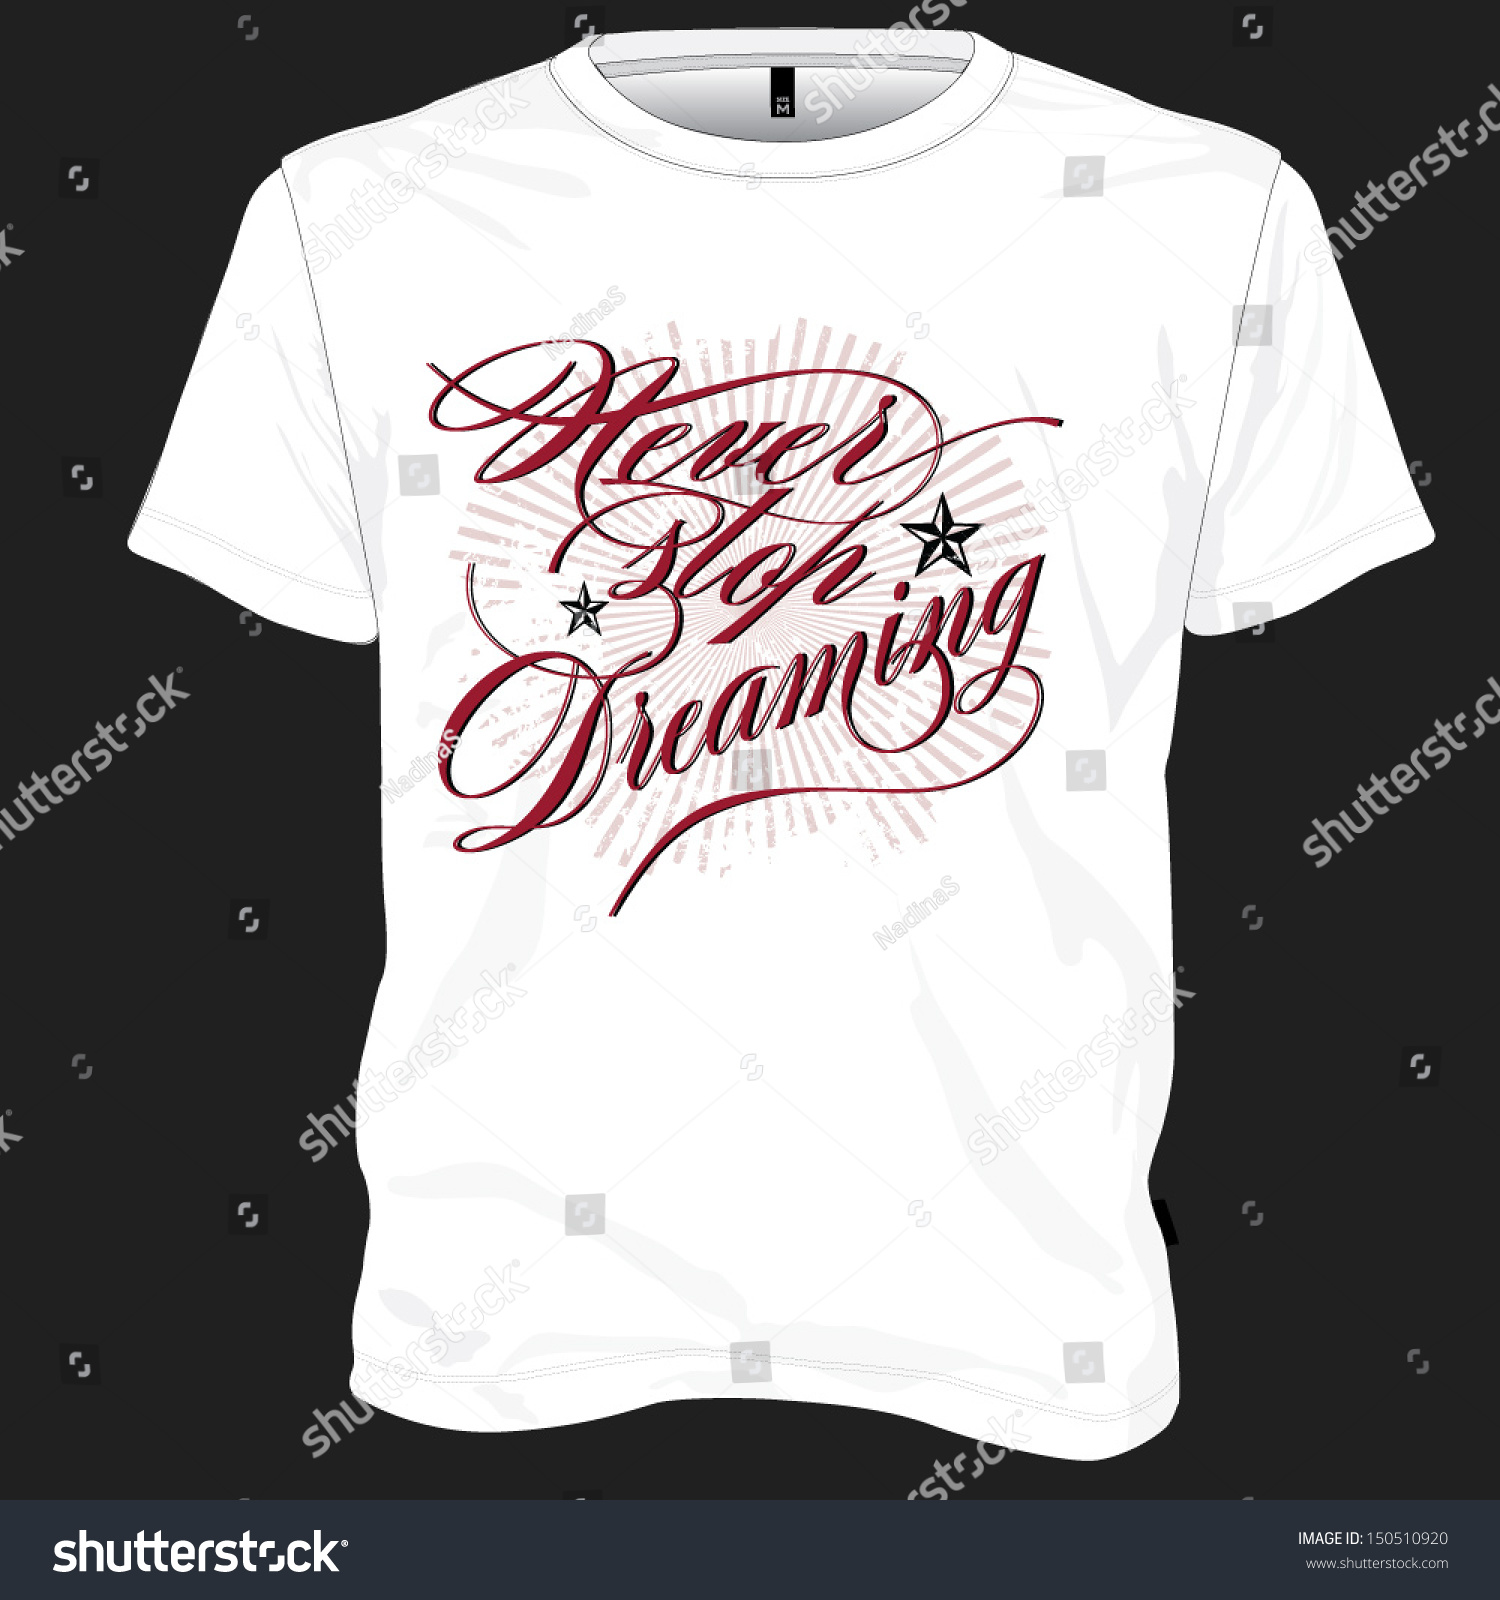 Tshirt design never stop dreaming stock vector 150510920 for Stock t shirt designs